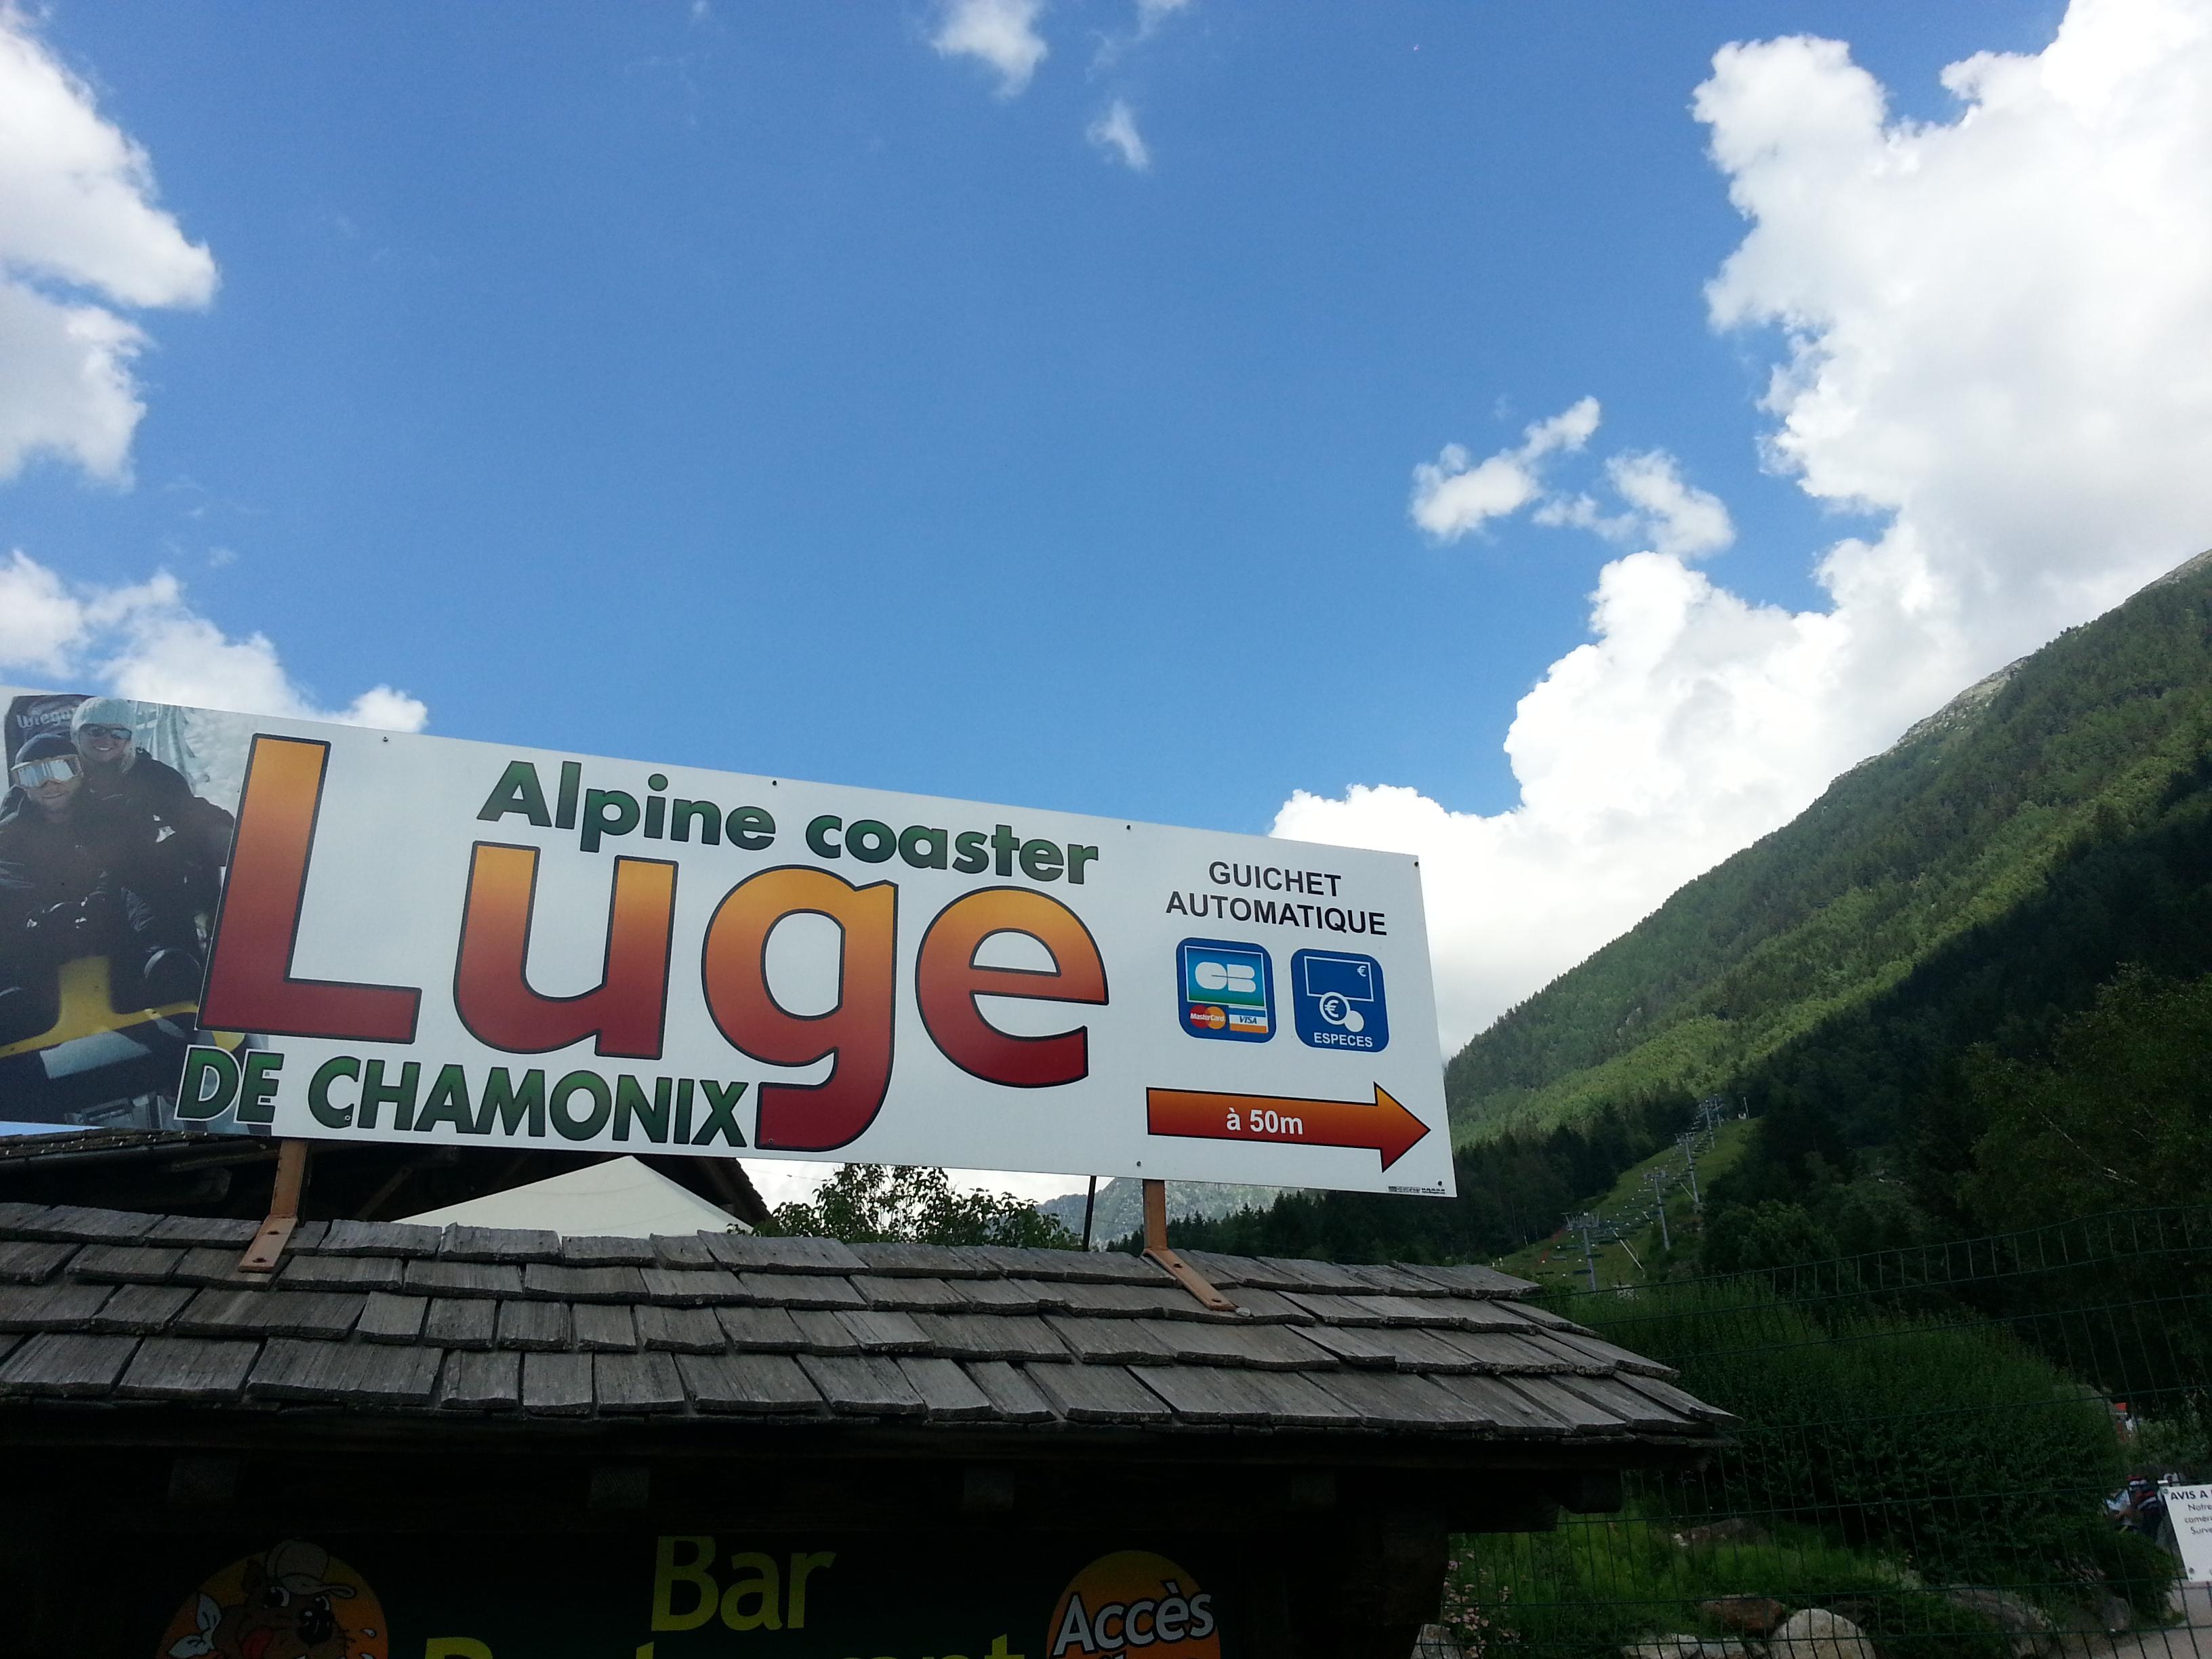 alpine coaster luge d'ete chamonix mont blanc